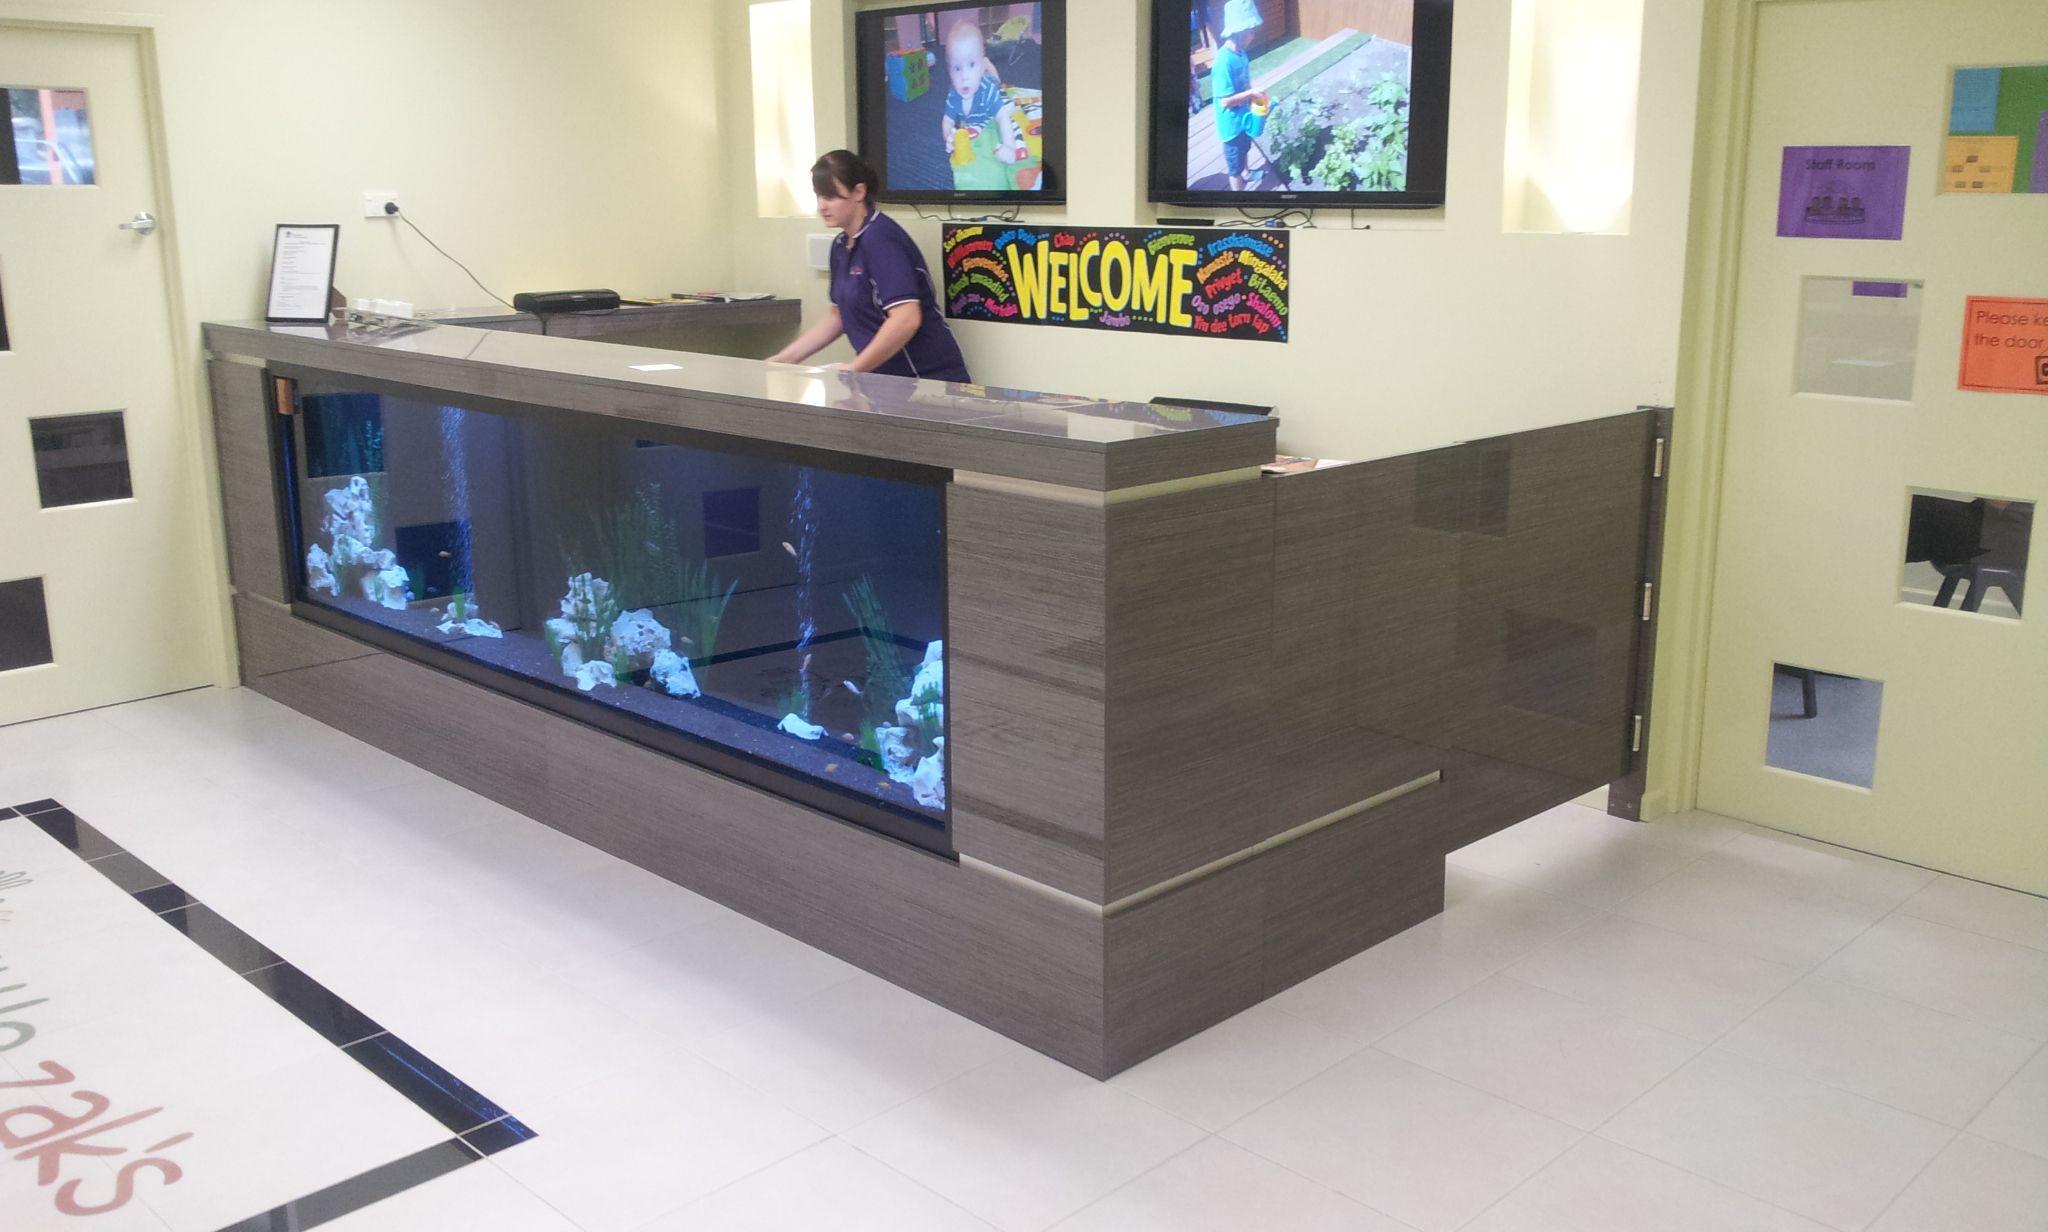 67270db1c35201e153d8bb448f1f8ebb Frais De Aquarium En Bois Schème